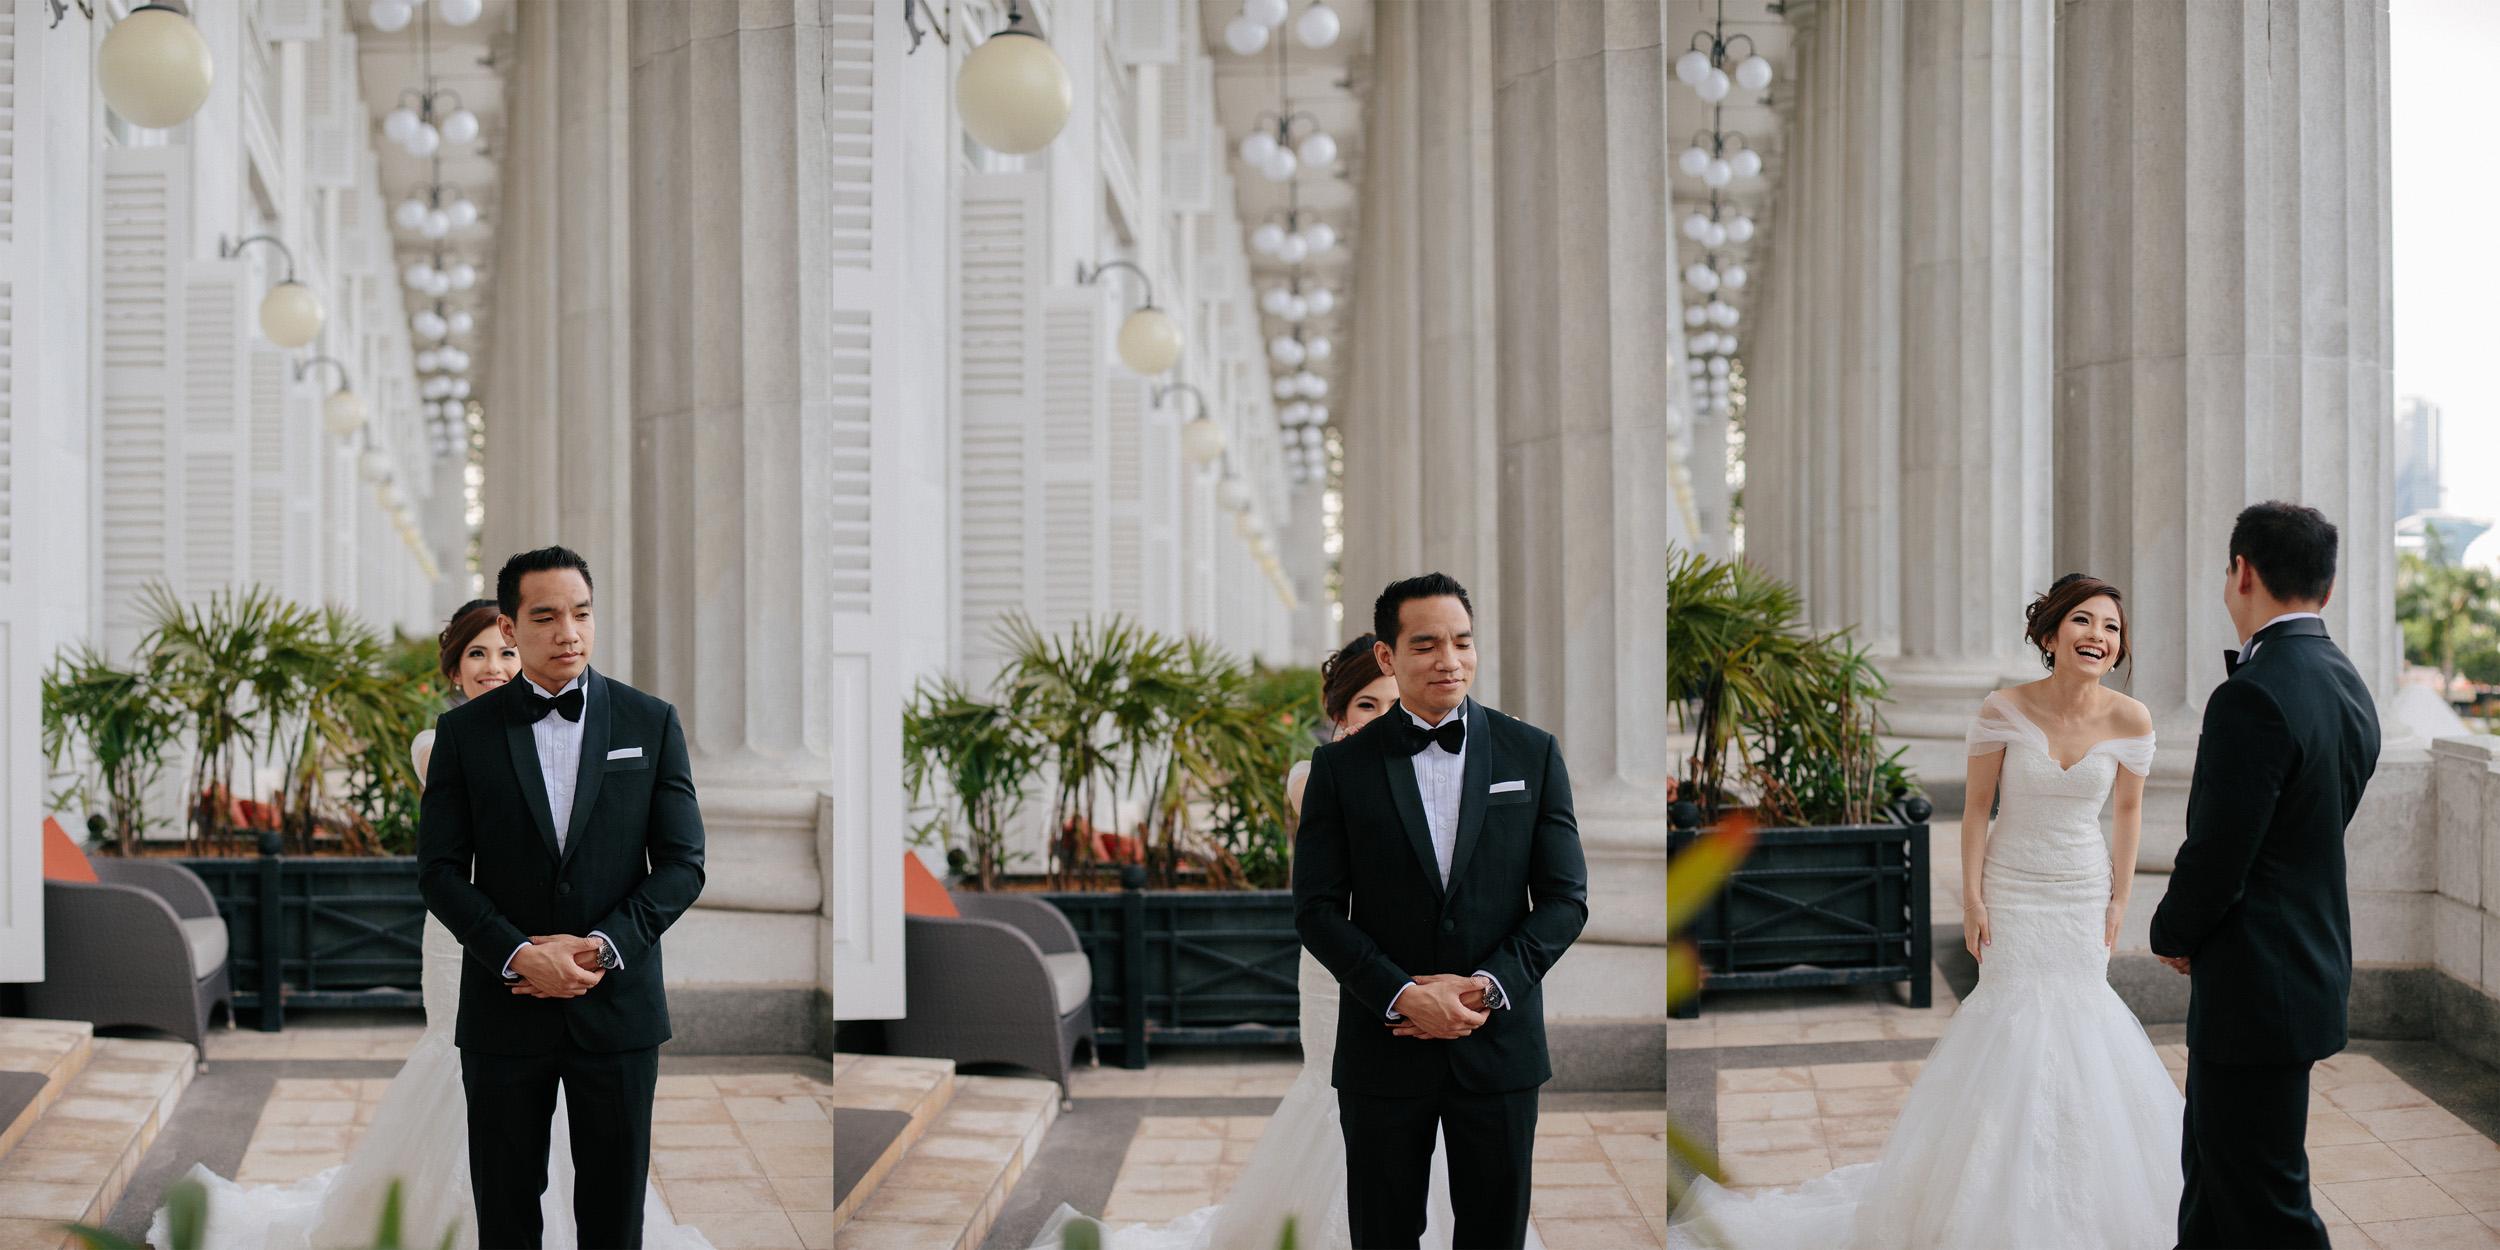 singapore-wedding-photographer-photography-wmt2017-100.jpg